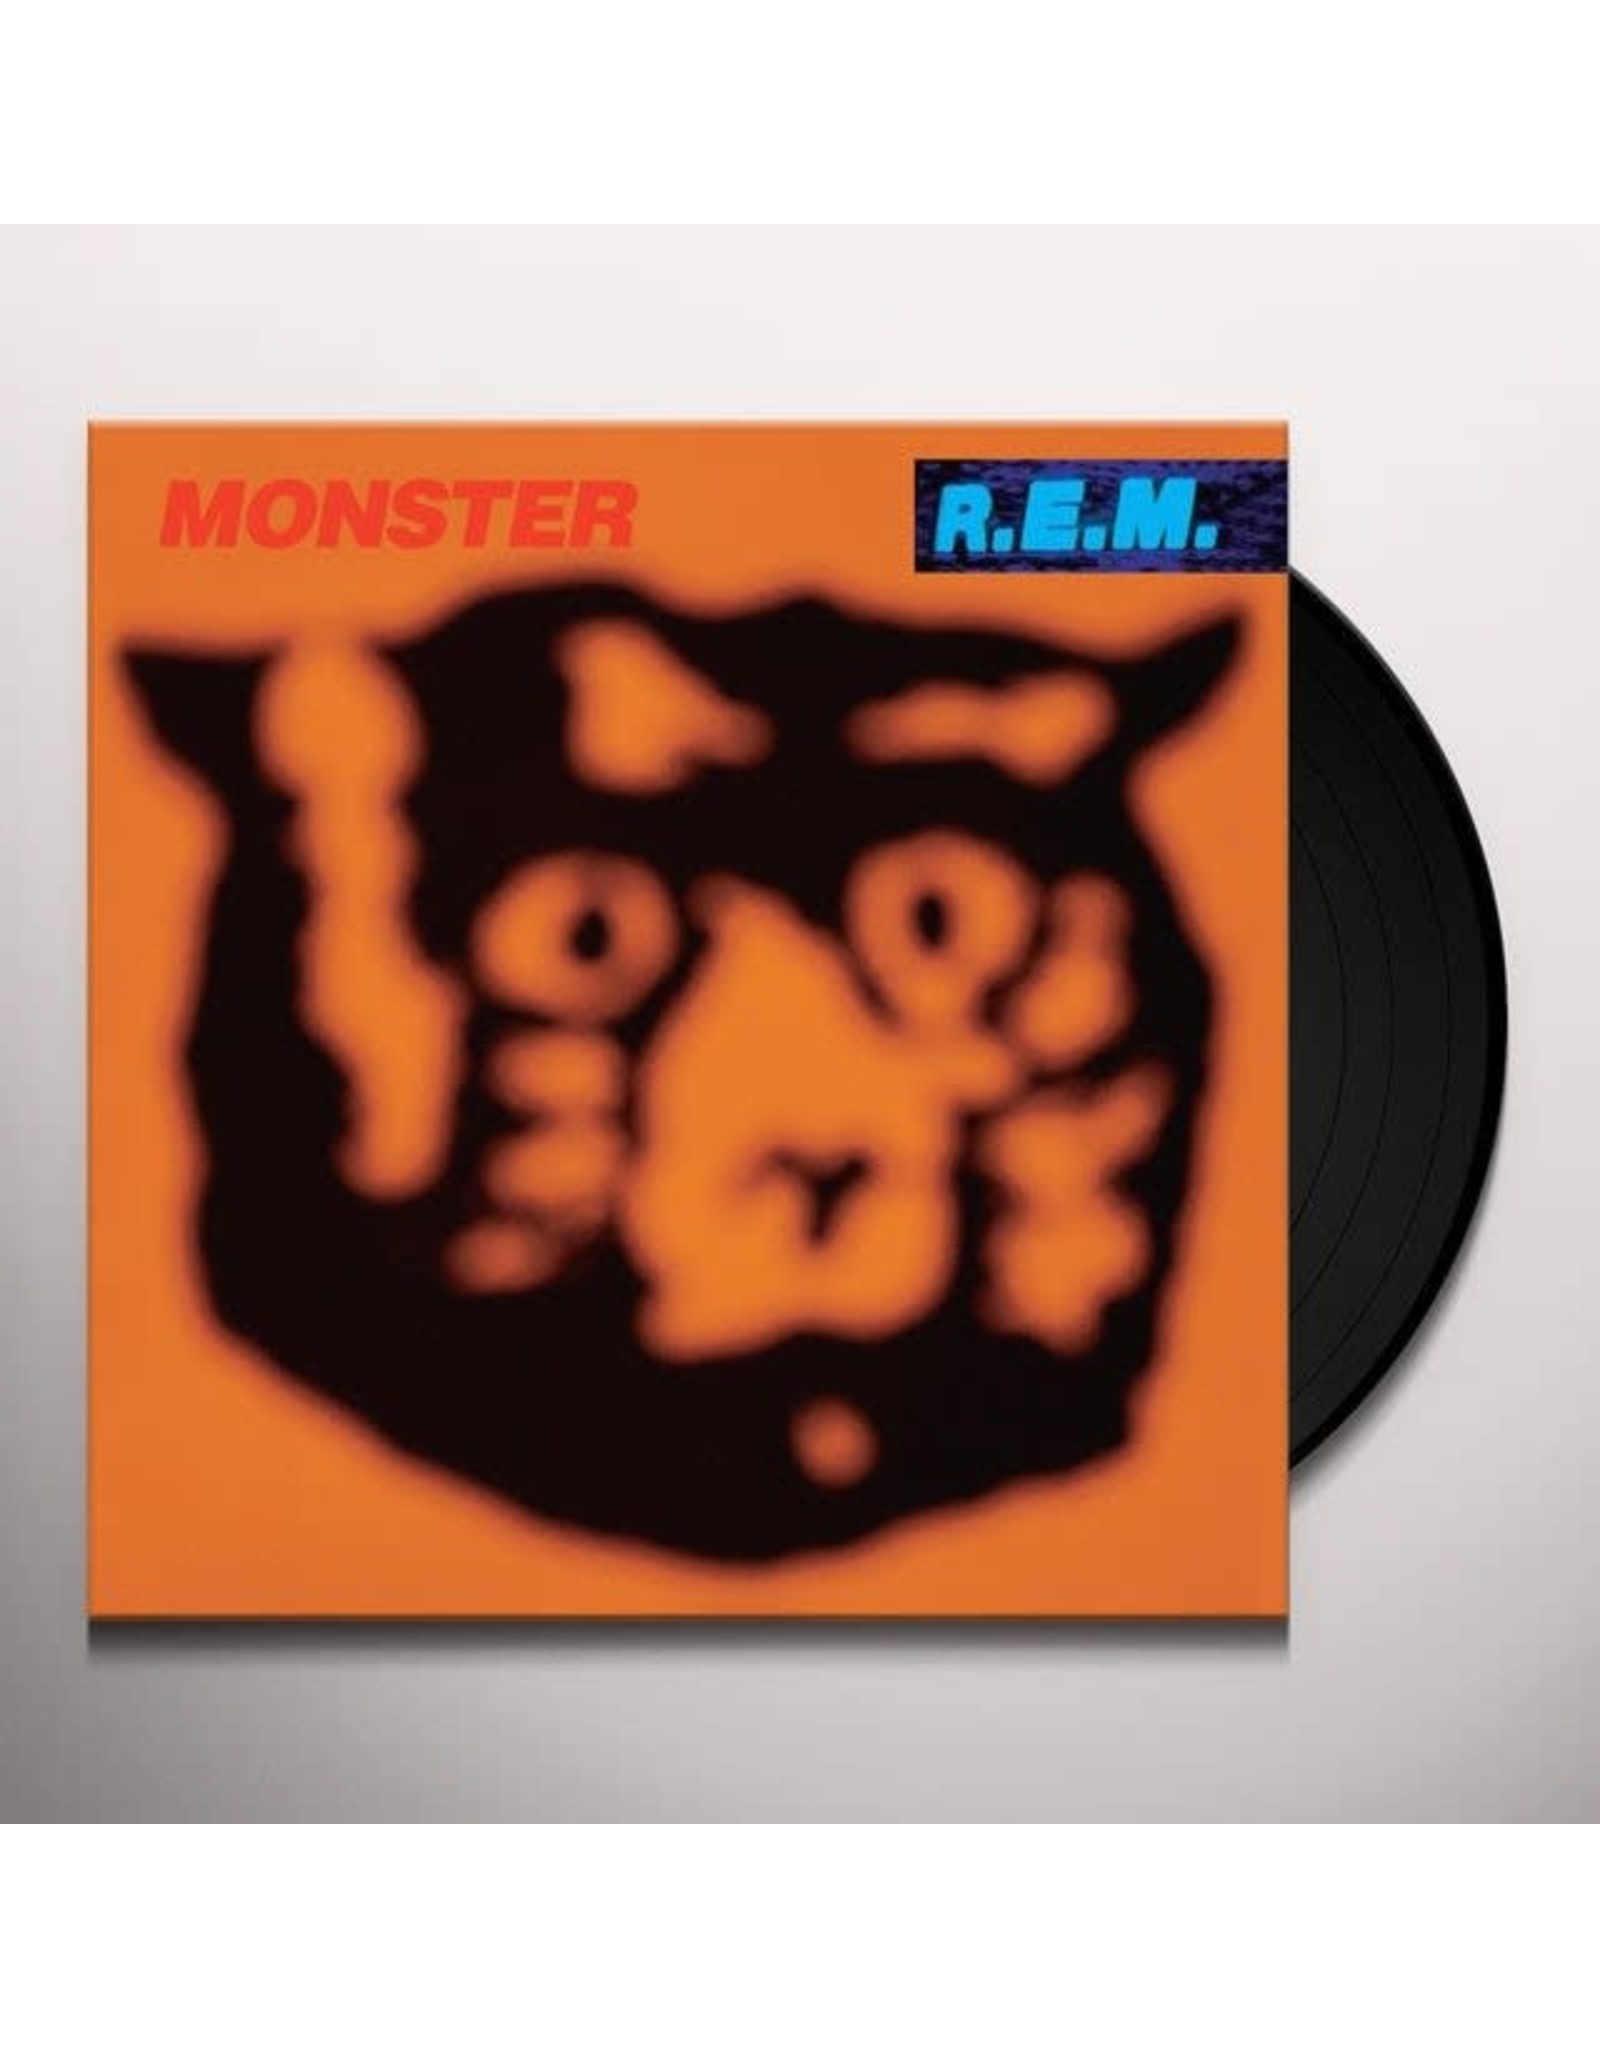 R.E.M. - Monster (25th Anniversary) LP